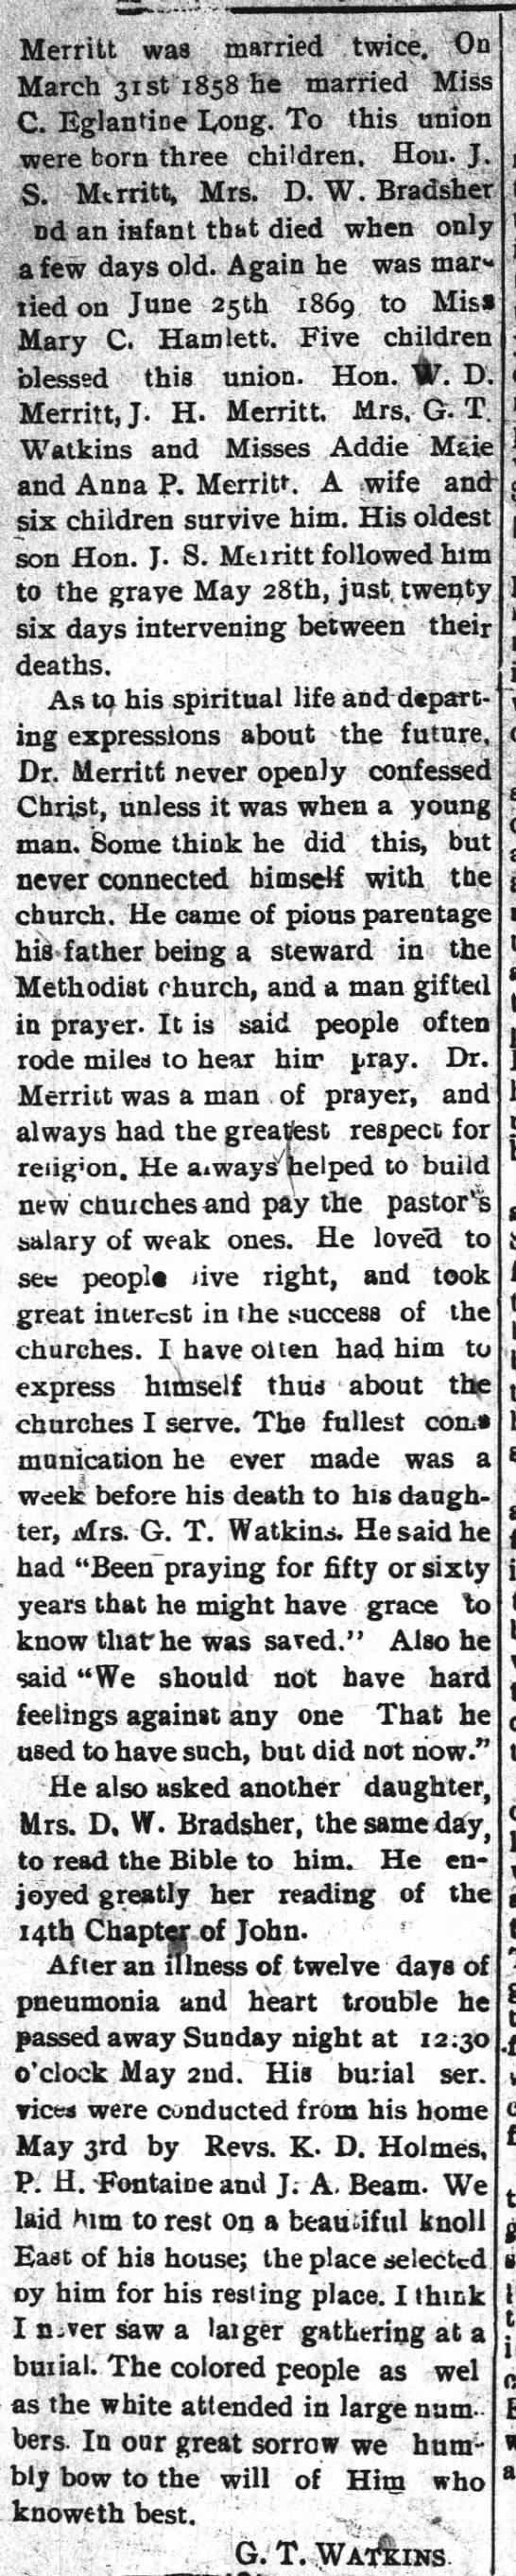 Dr. William Merritt (22 Jun 1904, The Roxboro Courier, Roxboro, NC) Part 2 -